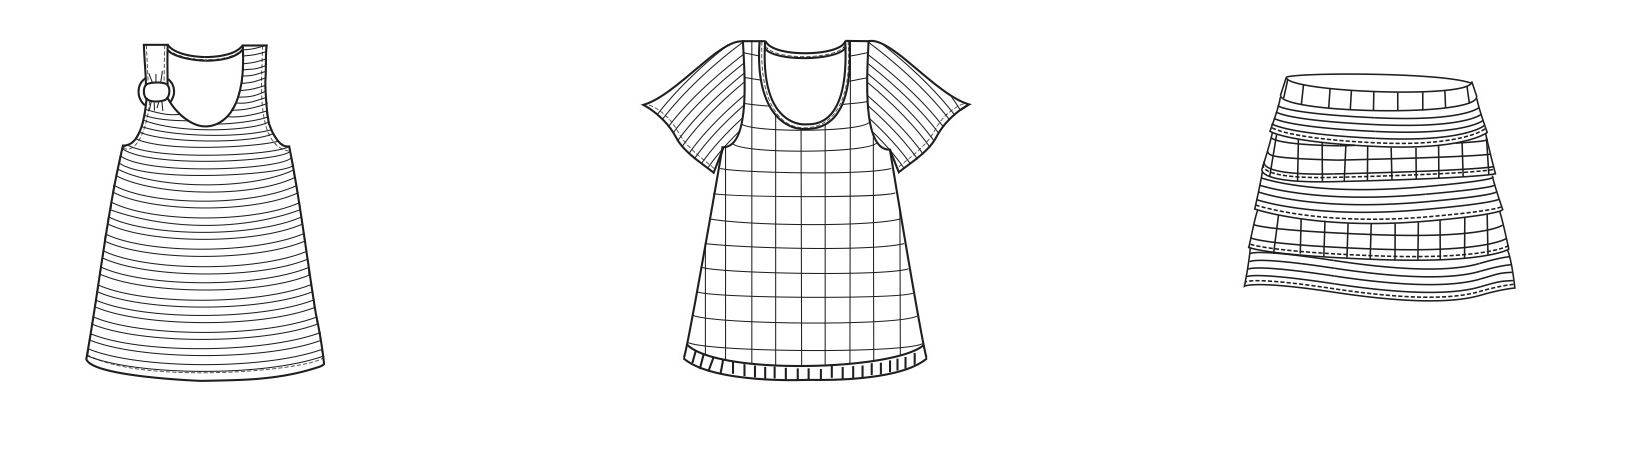 tech drawing 4.jpg